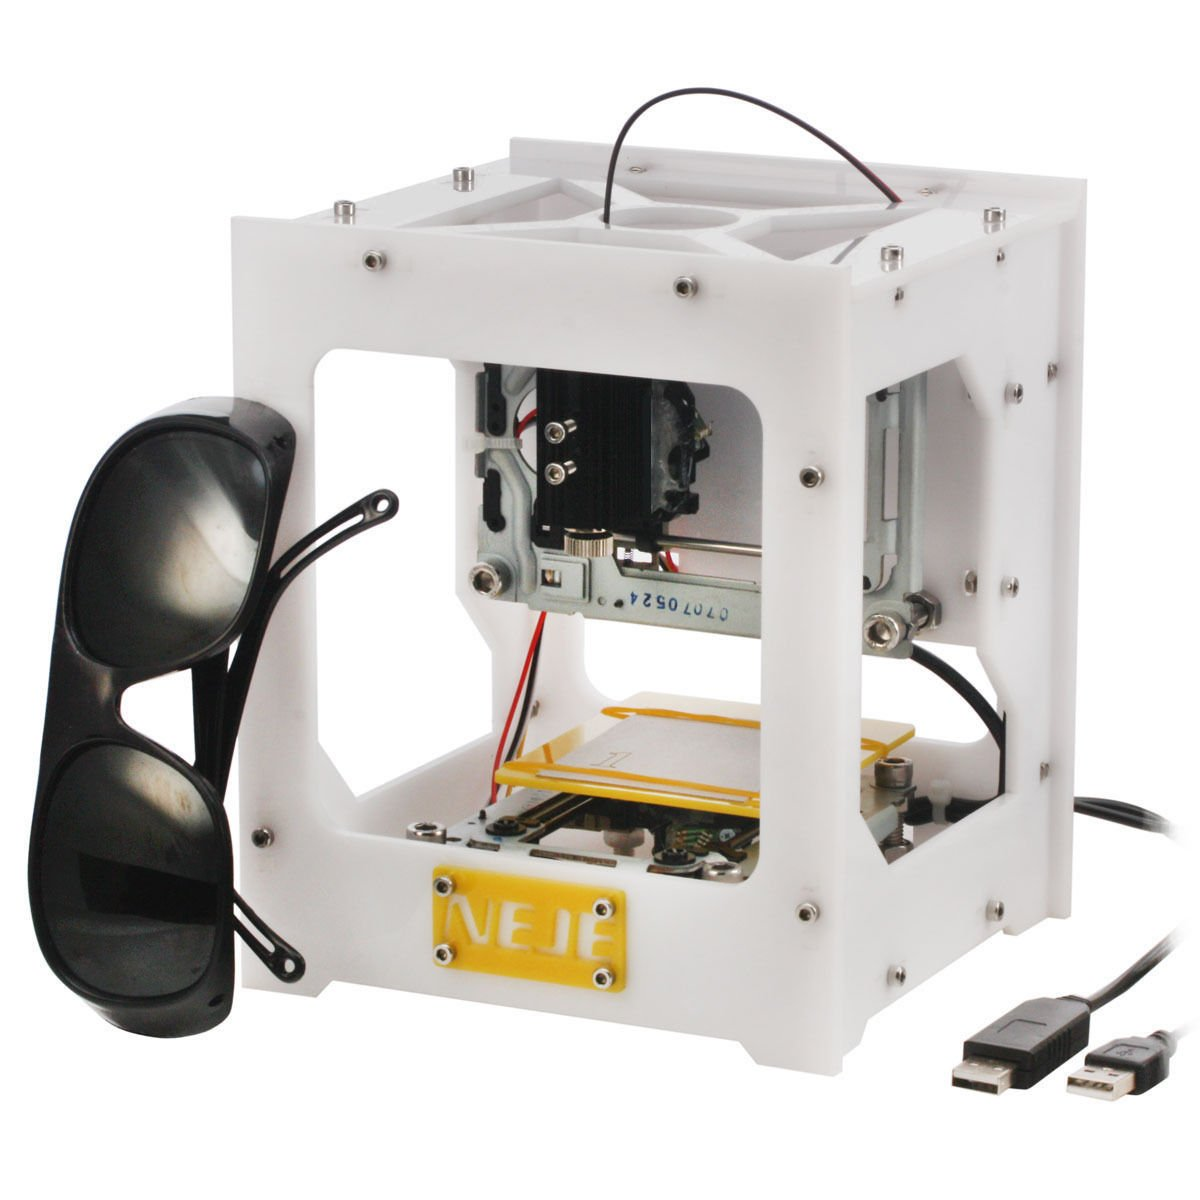 300MW USB DIY Laser Engraver Cutter Engraving Cutting ...